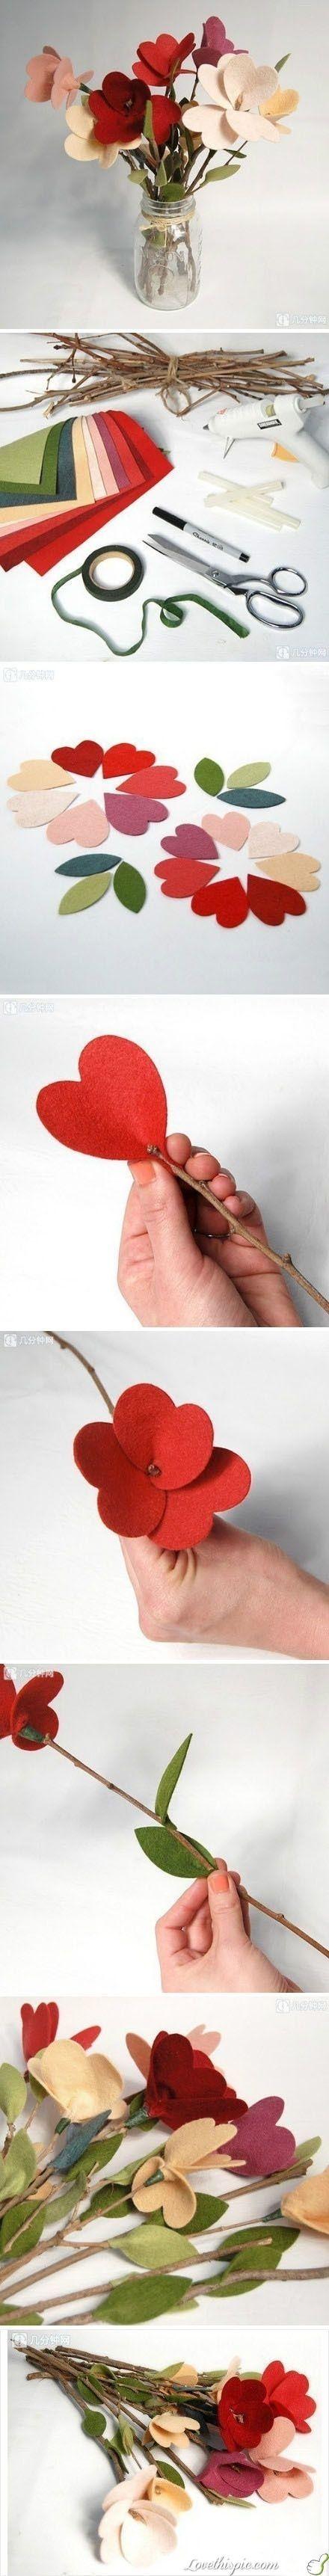 DIY Felt flower Vase tutorial. Amazing Crafts to decorate in Holidays